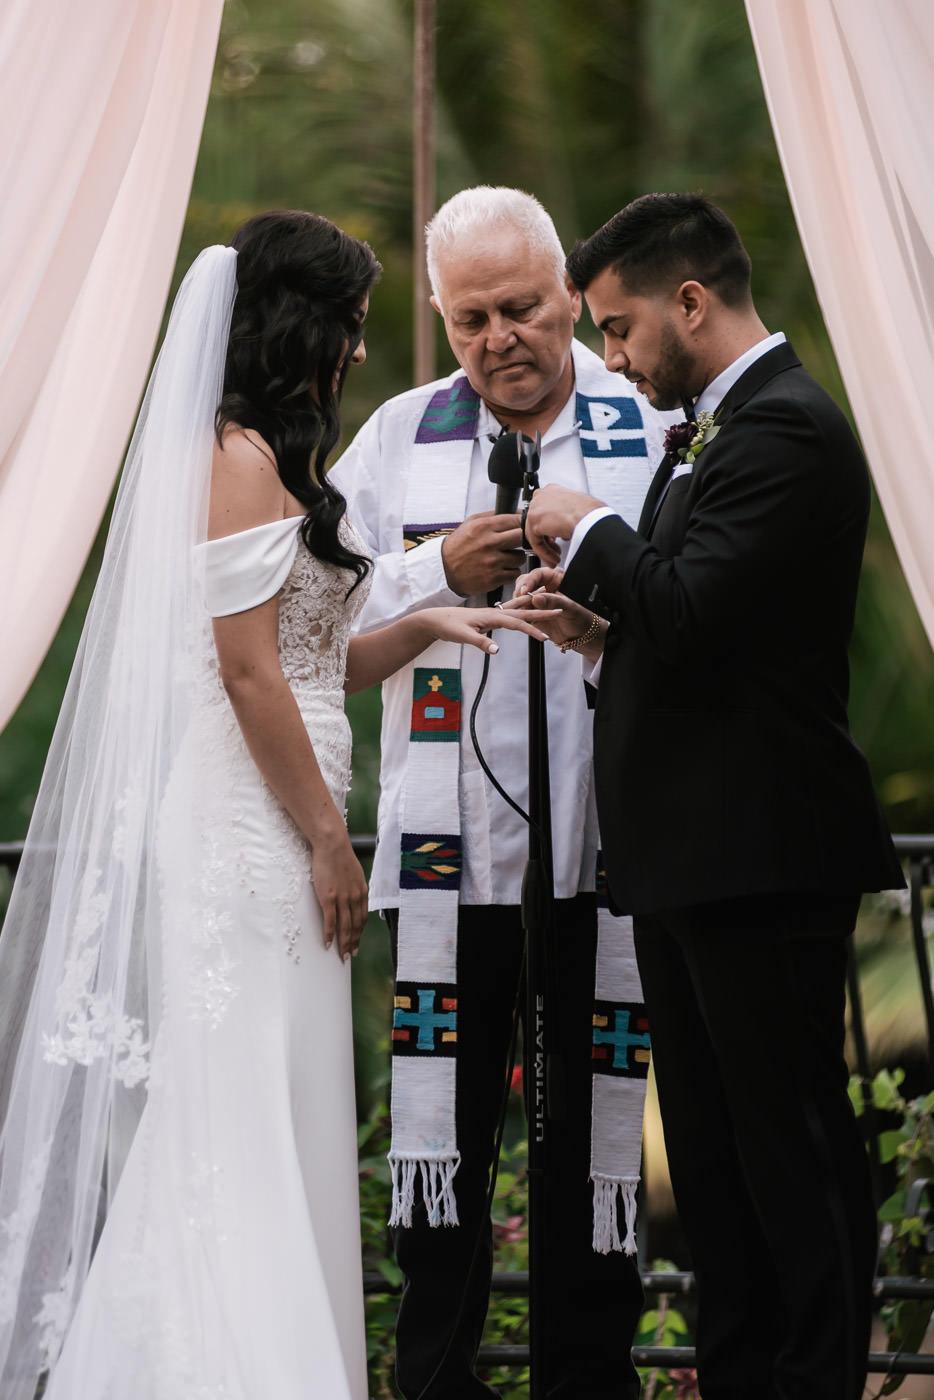 eden-gardens-wedding-photographer-romantic-52.jpg